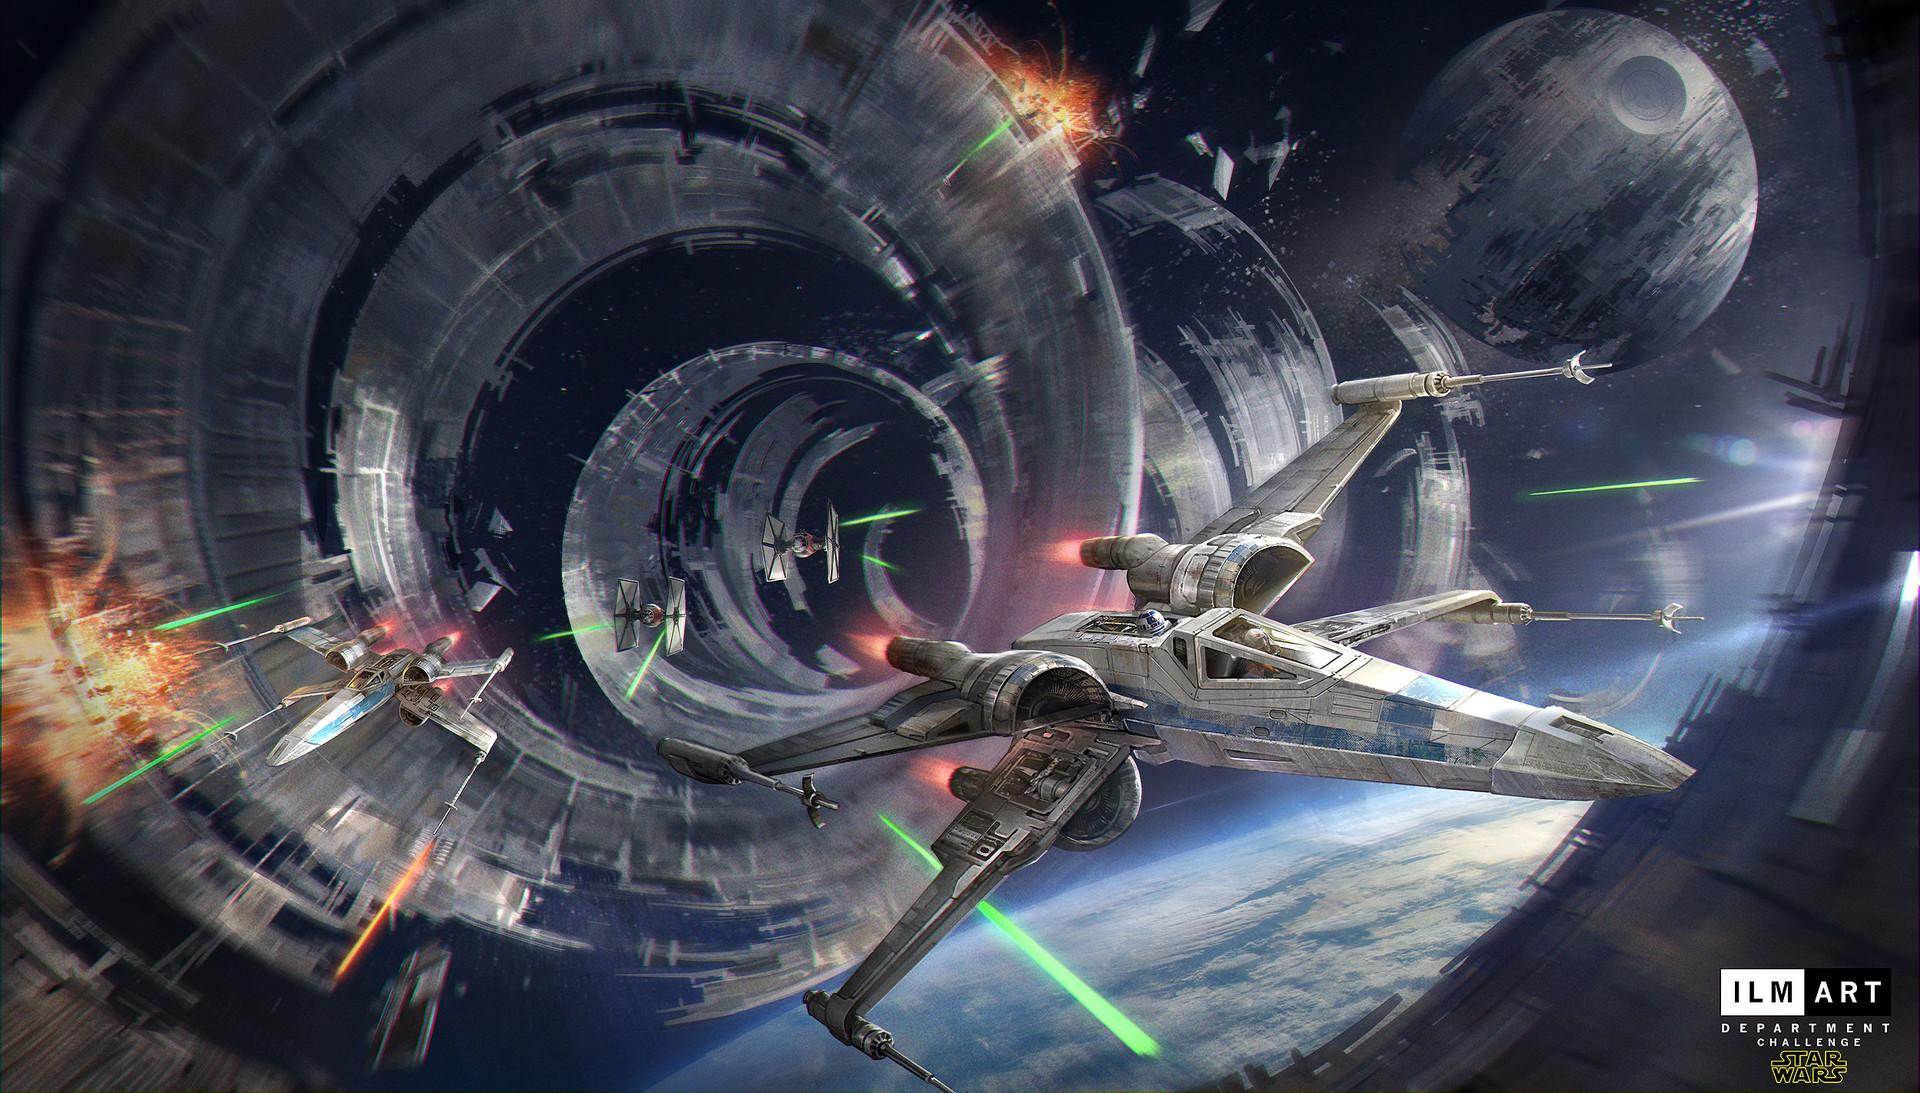 Wallpaper Star Wars X Wing Spaceship Tie Fighter Blaster Fighting Dogfight Death Star Tunnel Laser 1920x1093 Mariocello 1748315 Hd Wallpapers Wallhere